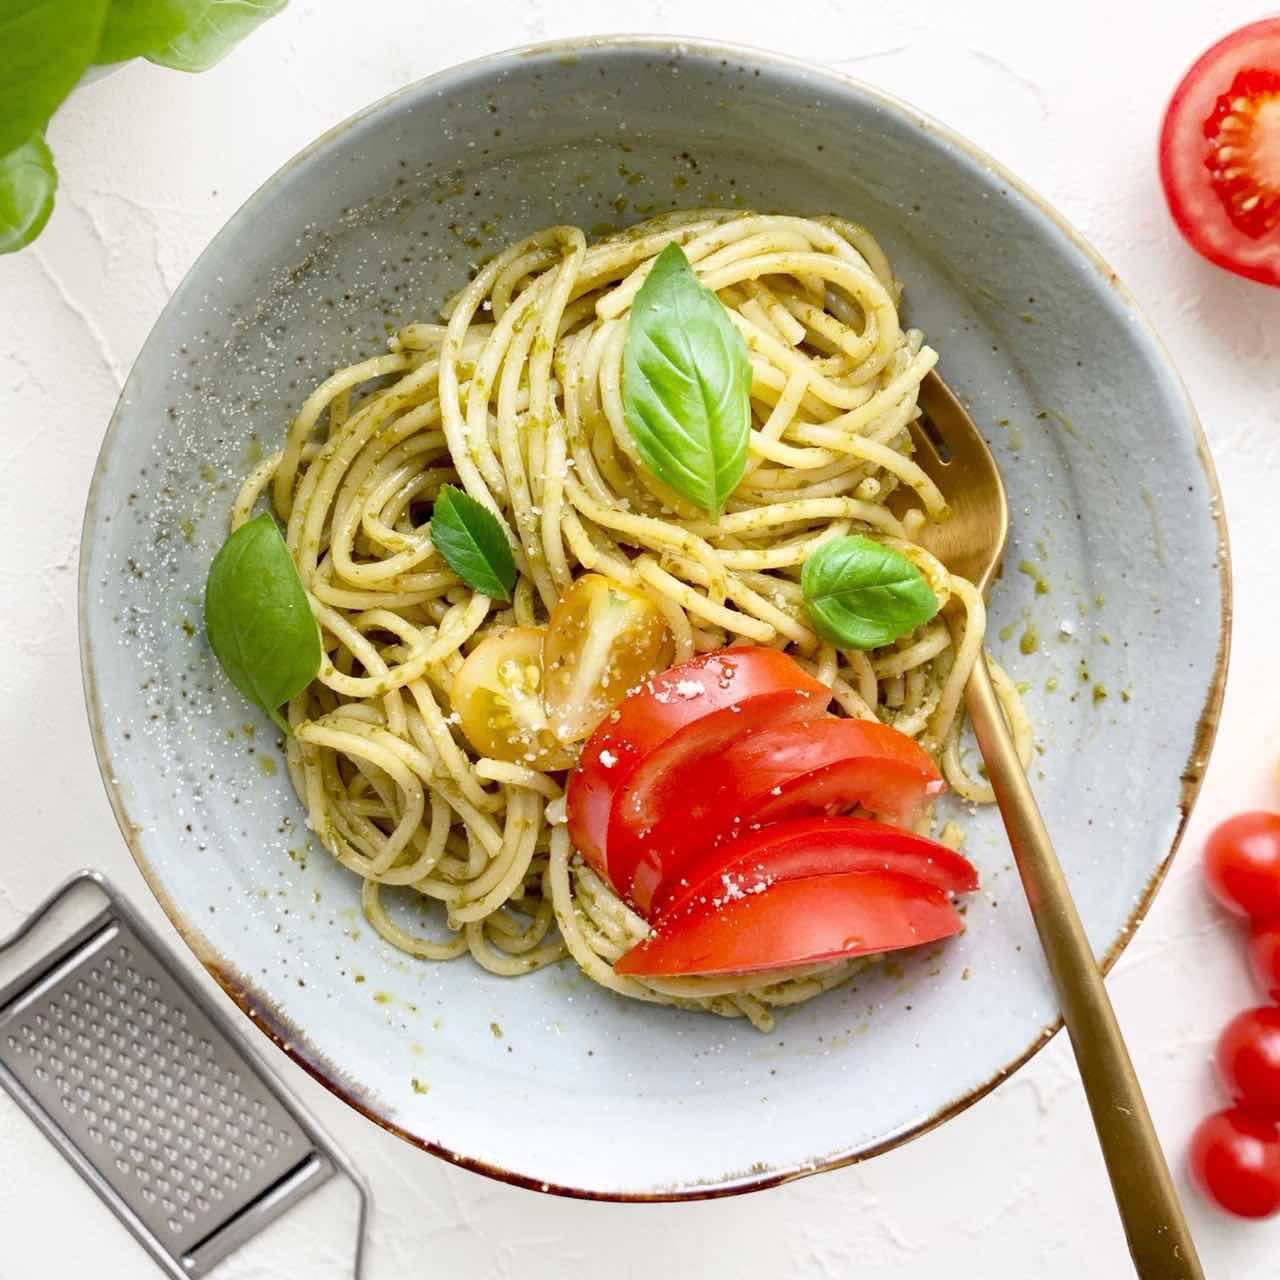 Spaghetti al pesto genovese